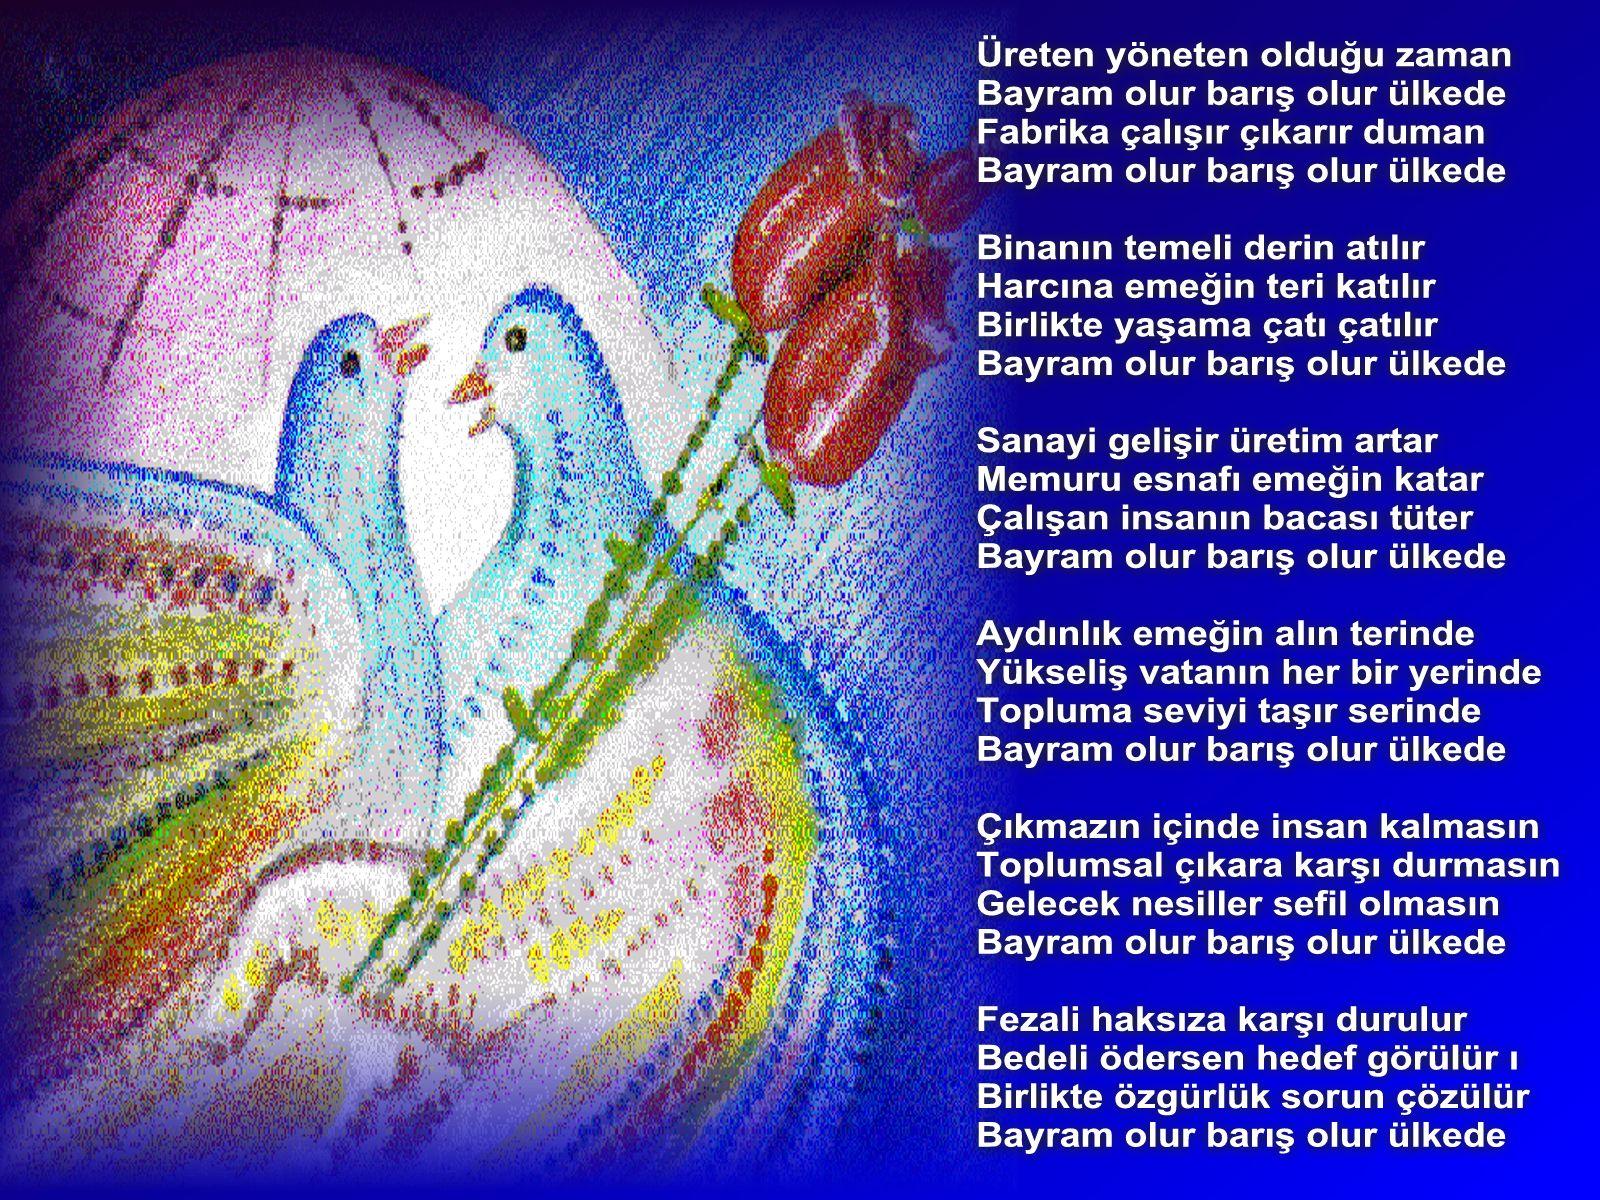 bayram baris